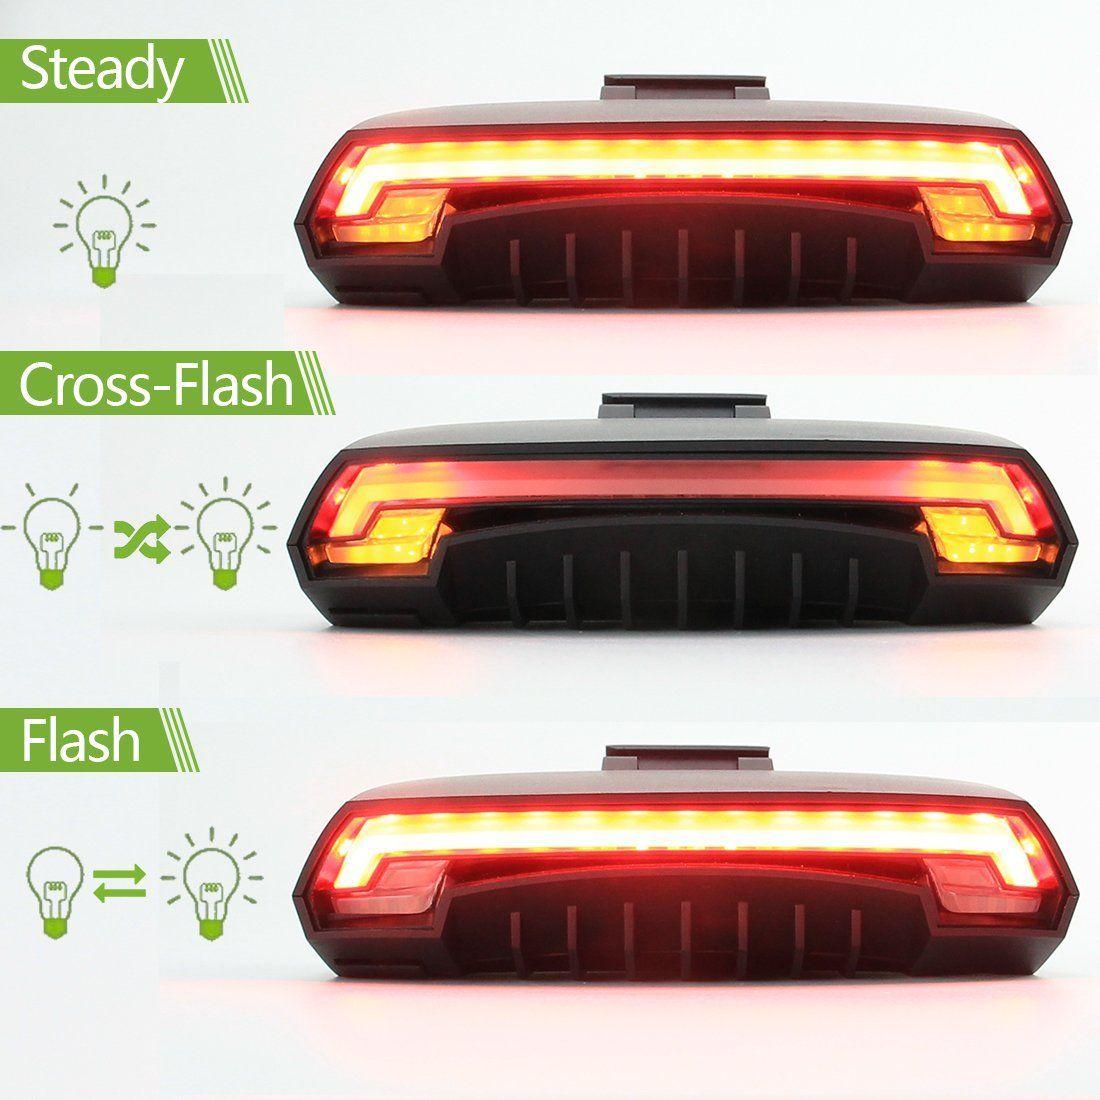 REDLINE LASER LIGHT LANE WITH 5 LED TAIL BACK BIKE CYCLE SAFETY LIGHT